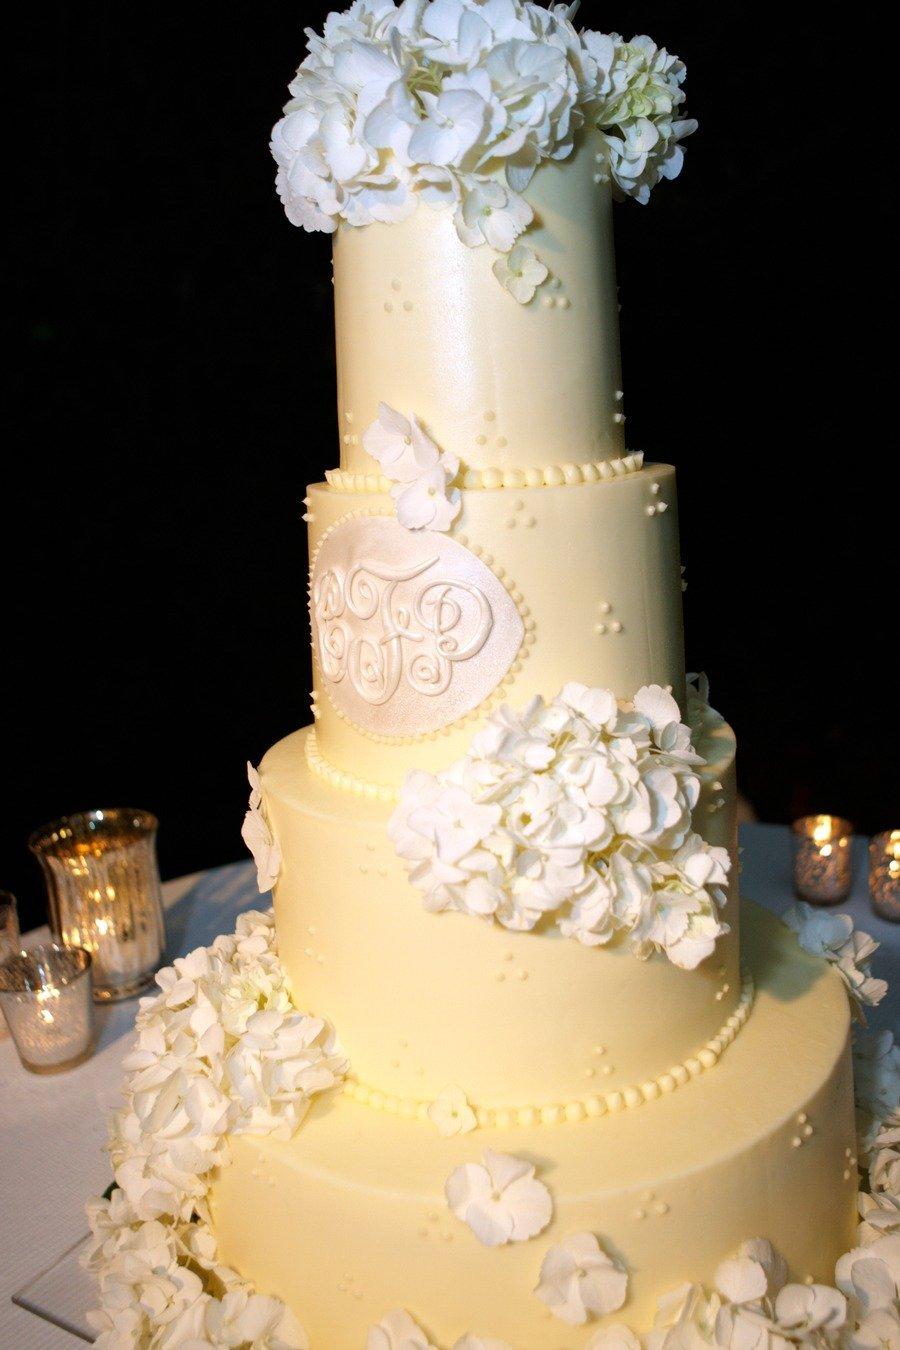 Custom-monogram-wedding-ideas-romantic-spring-cake.full